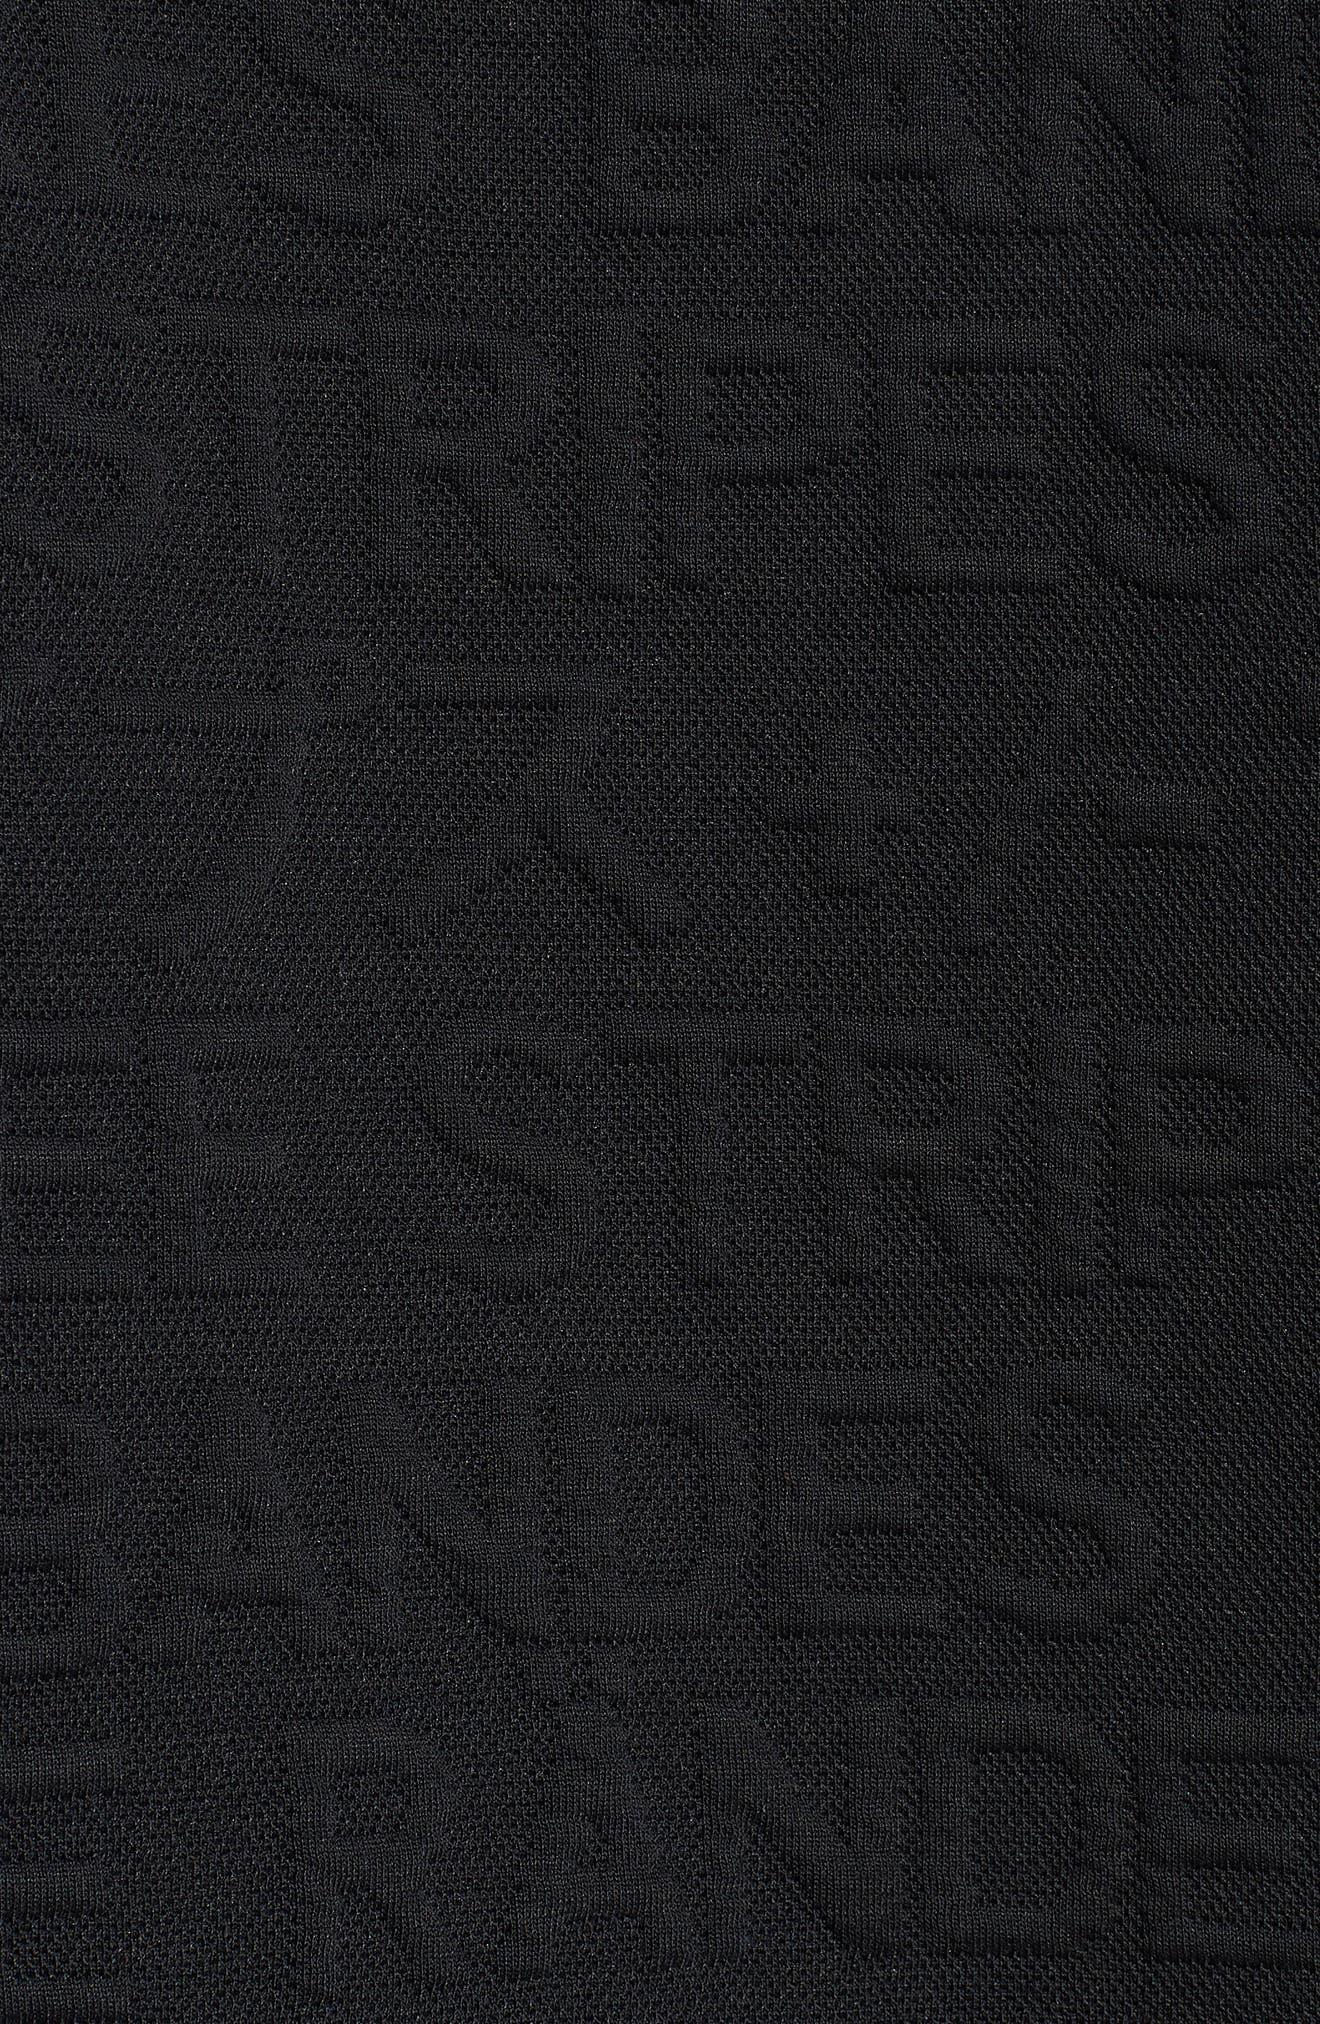 ADIDAS,                             3-Stripes Hoodie Sweatshirt,                             Alternate thumbnail 5, color,                             BLACK